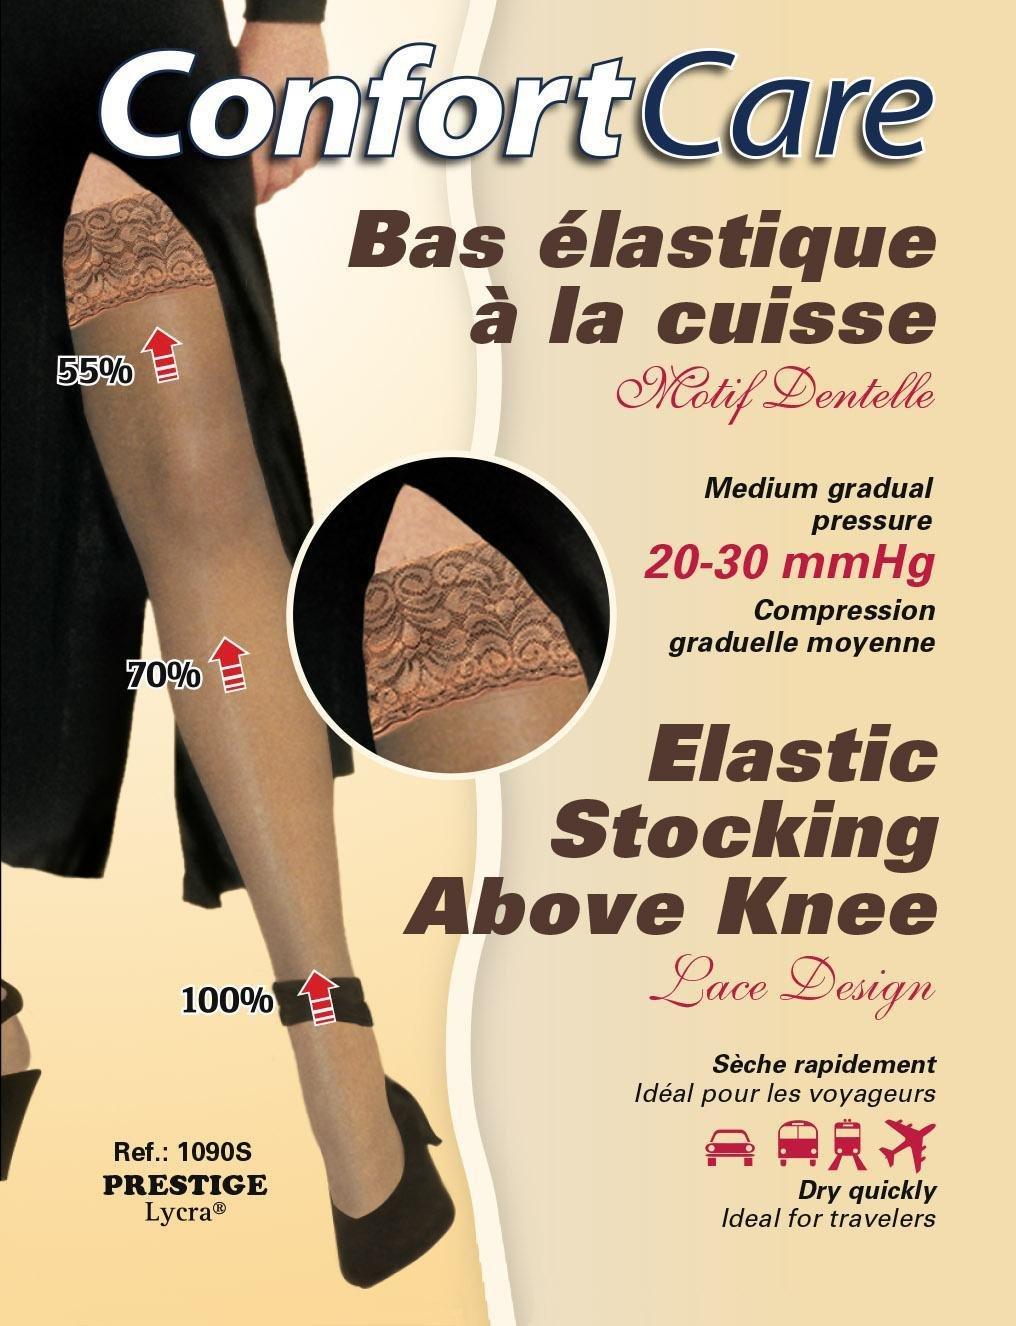 Bas Élastique à la Cuisse compression forte ( 20-30 mmHg) Elastic Stockings Above knee high compression